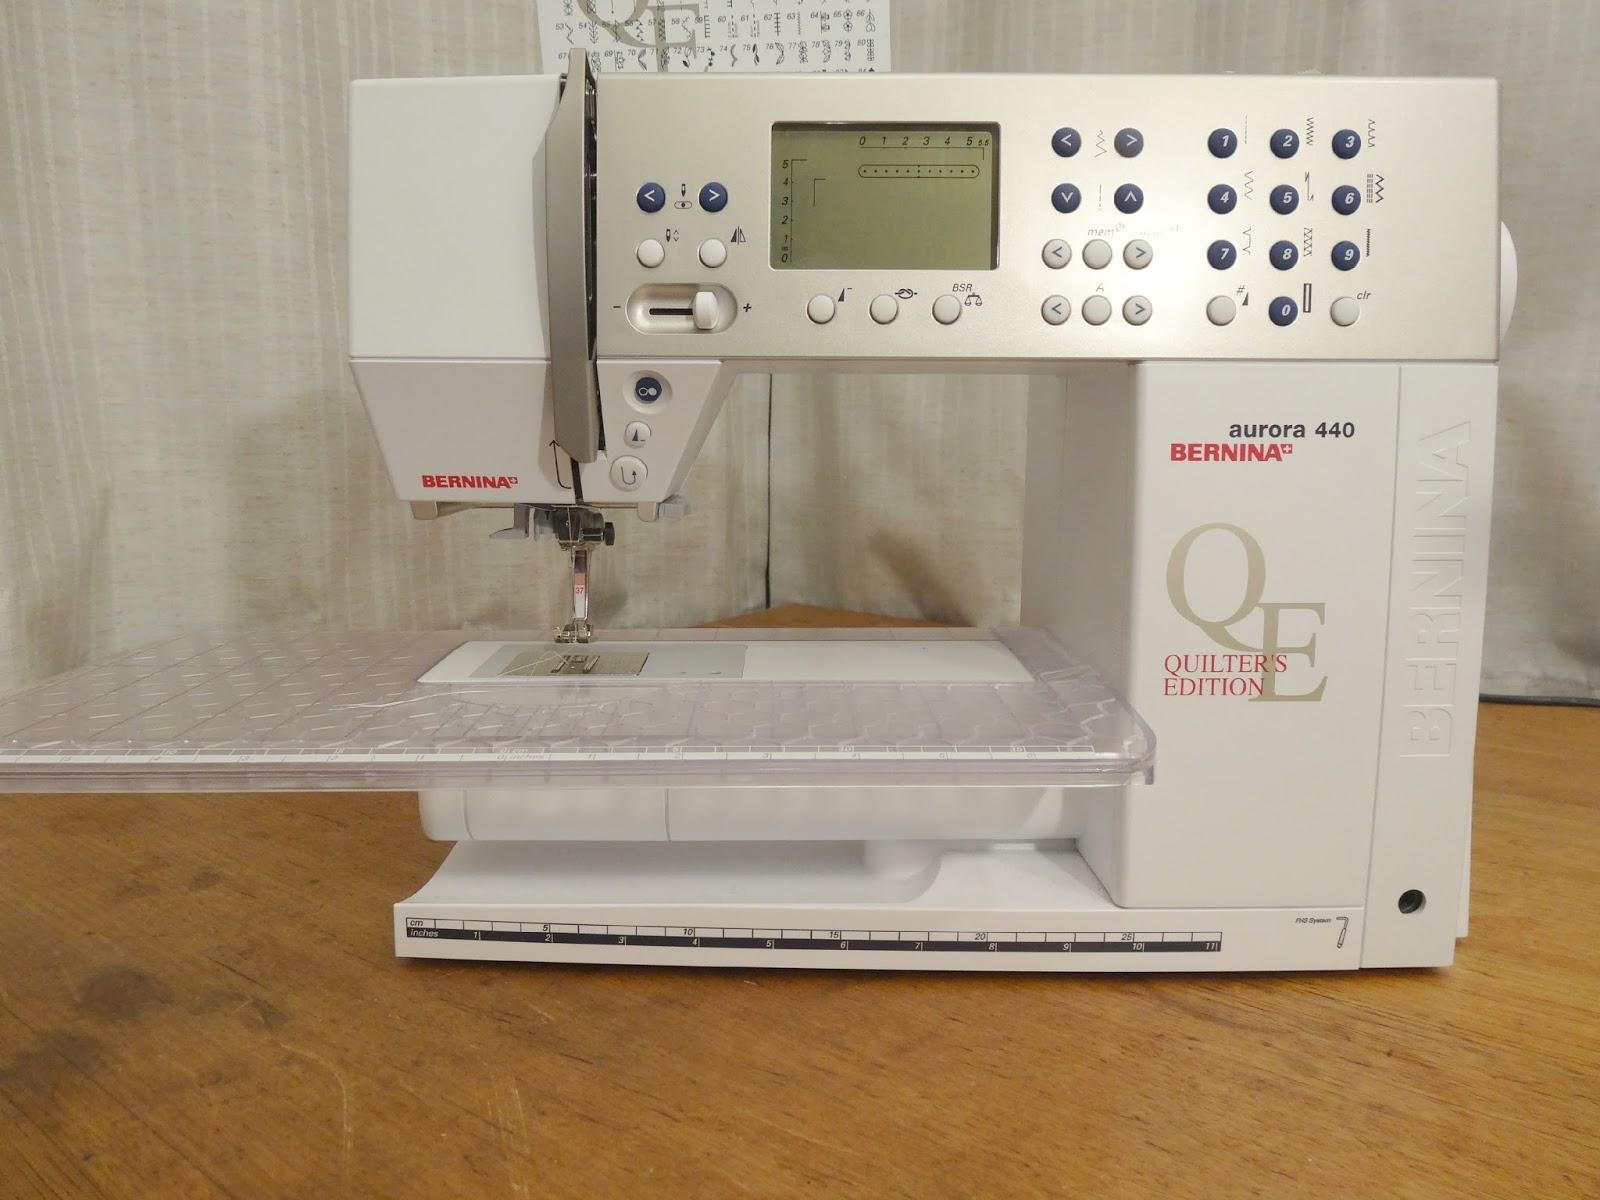 making rebecca lynne: Sewing Machine Adultery: Bernina Aurora 440 ... : bernina sewing machine reviews quilting - Adamdwight.com